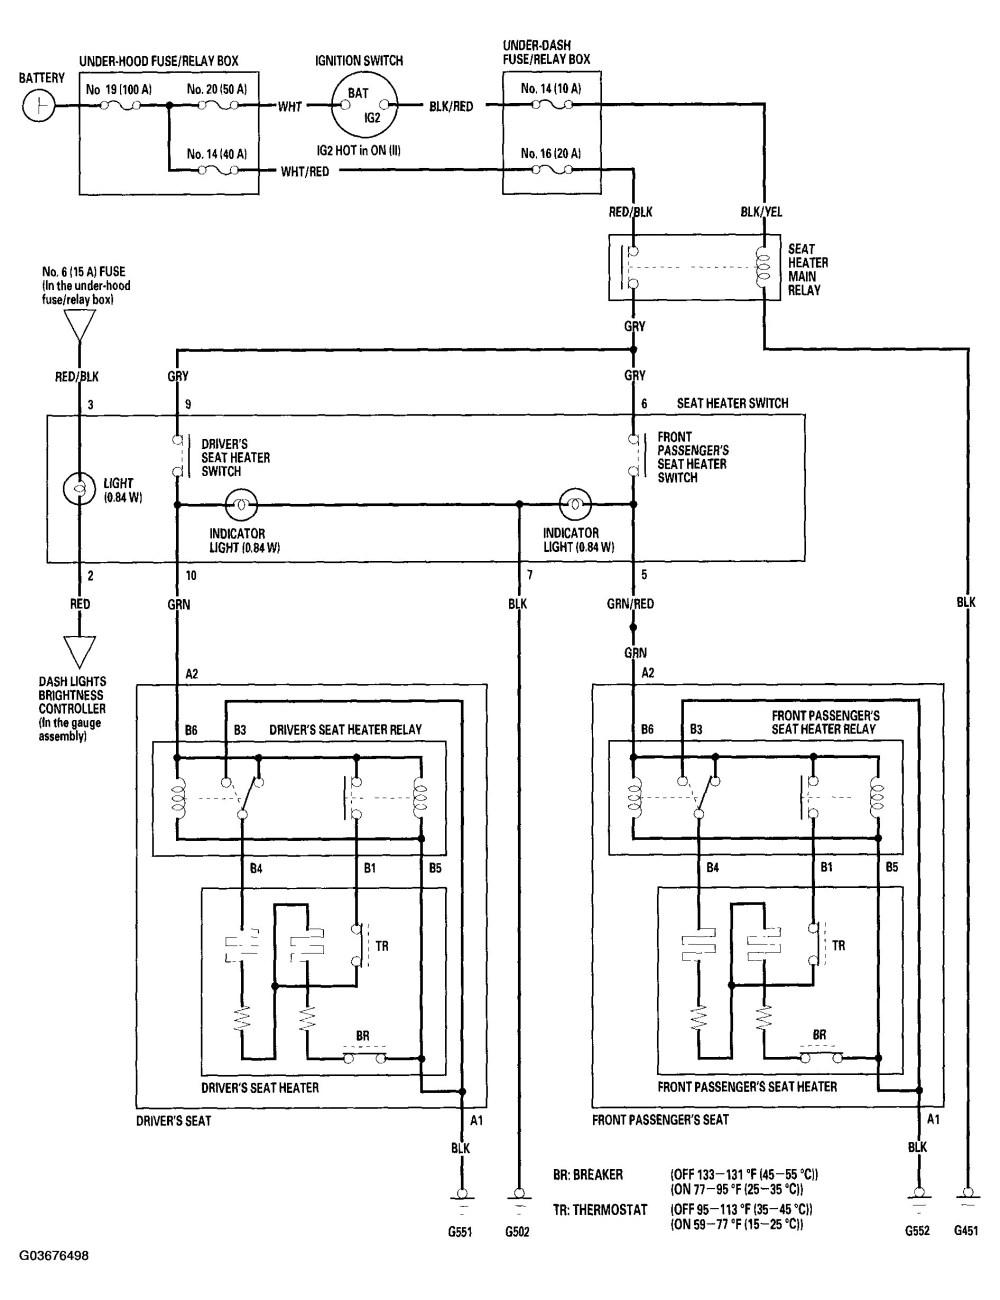 medium resolution of 2007 honda crv fuse box diagram basic electronics wiring diagram 2011 hyundai sonata wiring diagram 2007